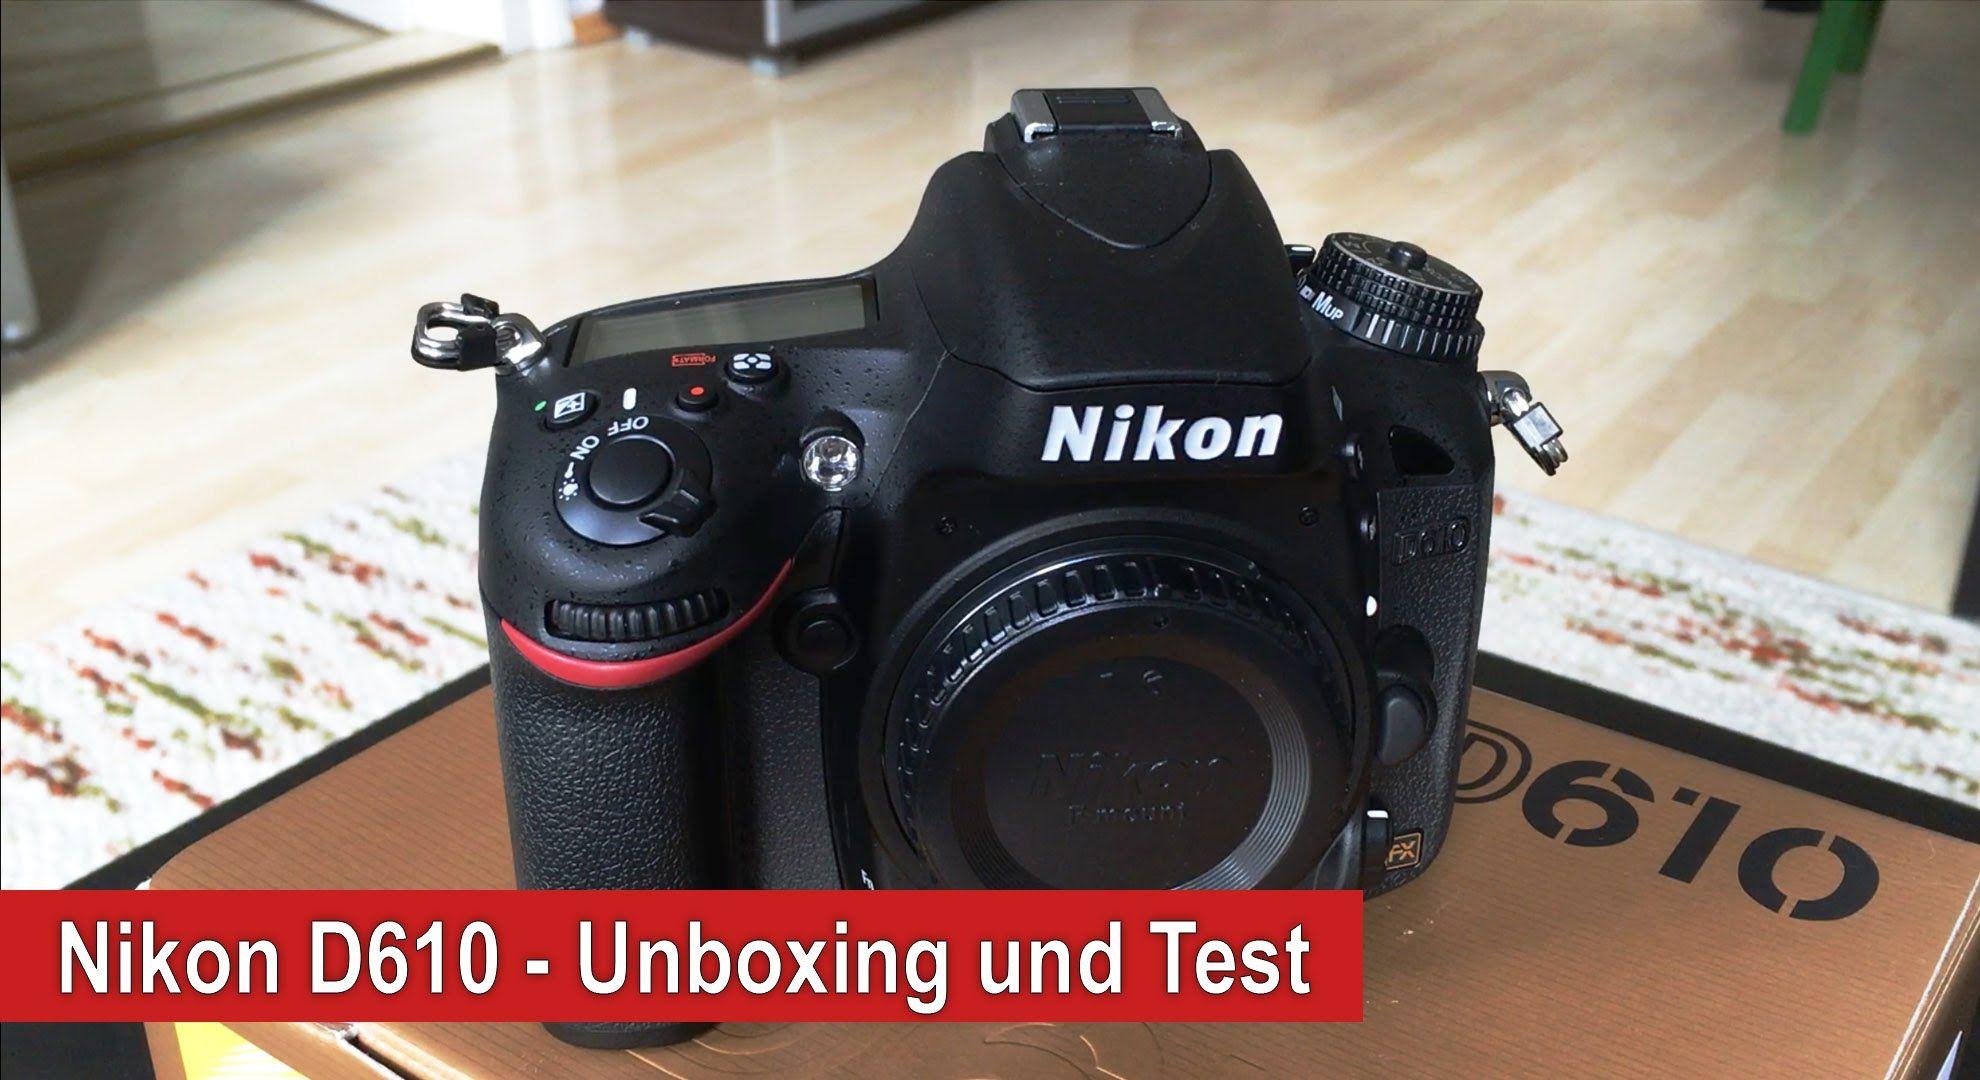 awesome Nikon D610 - Vollformat DSLR im Unboxing und Test